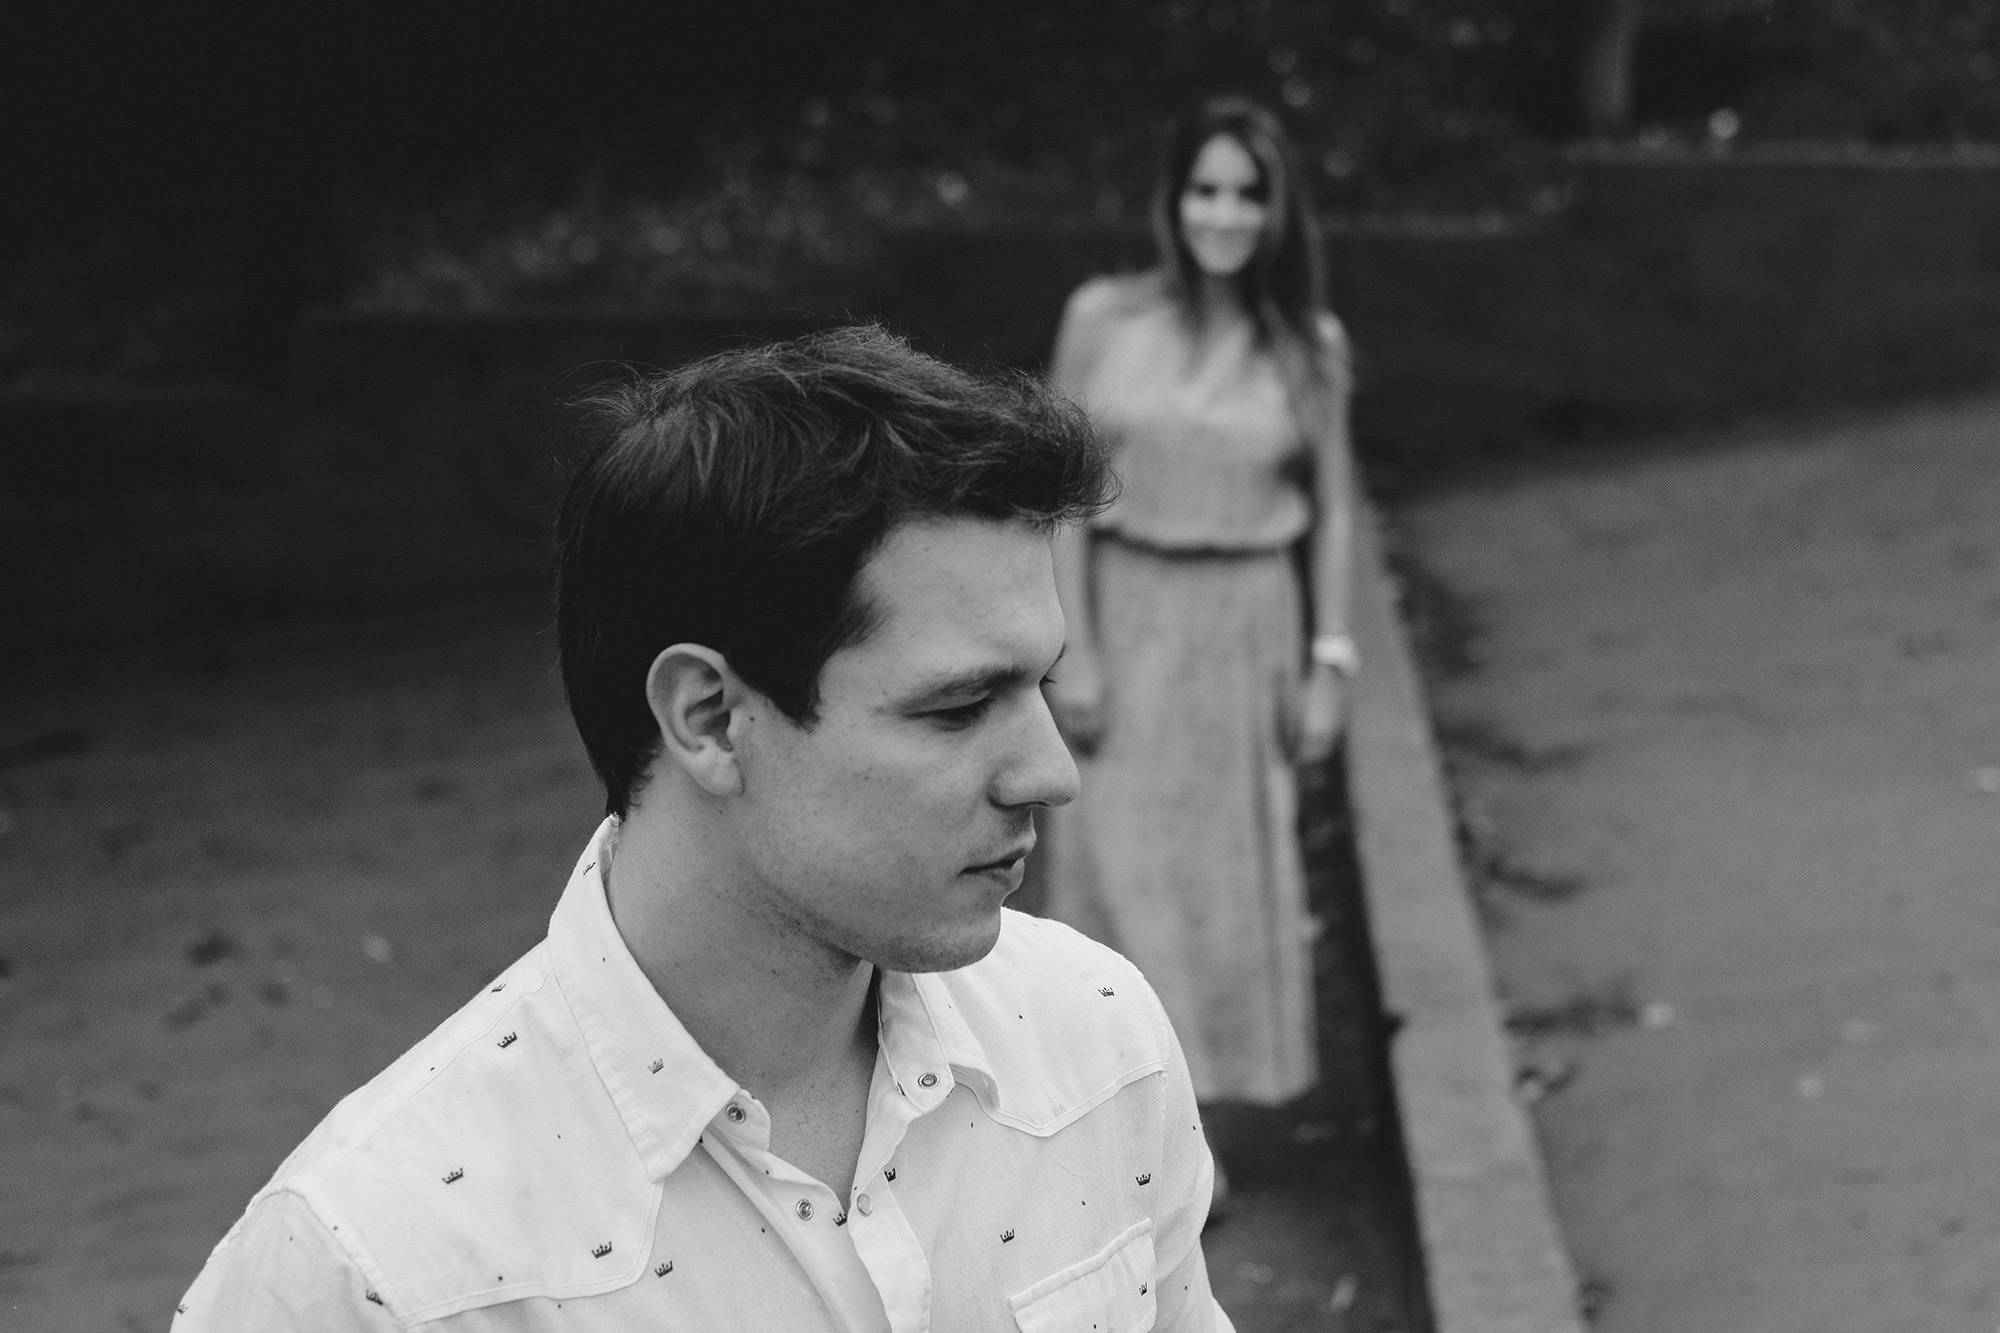 Laura e Rodrigo - Gustavo Semeghini - Ensaio - 03.jpg